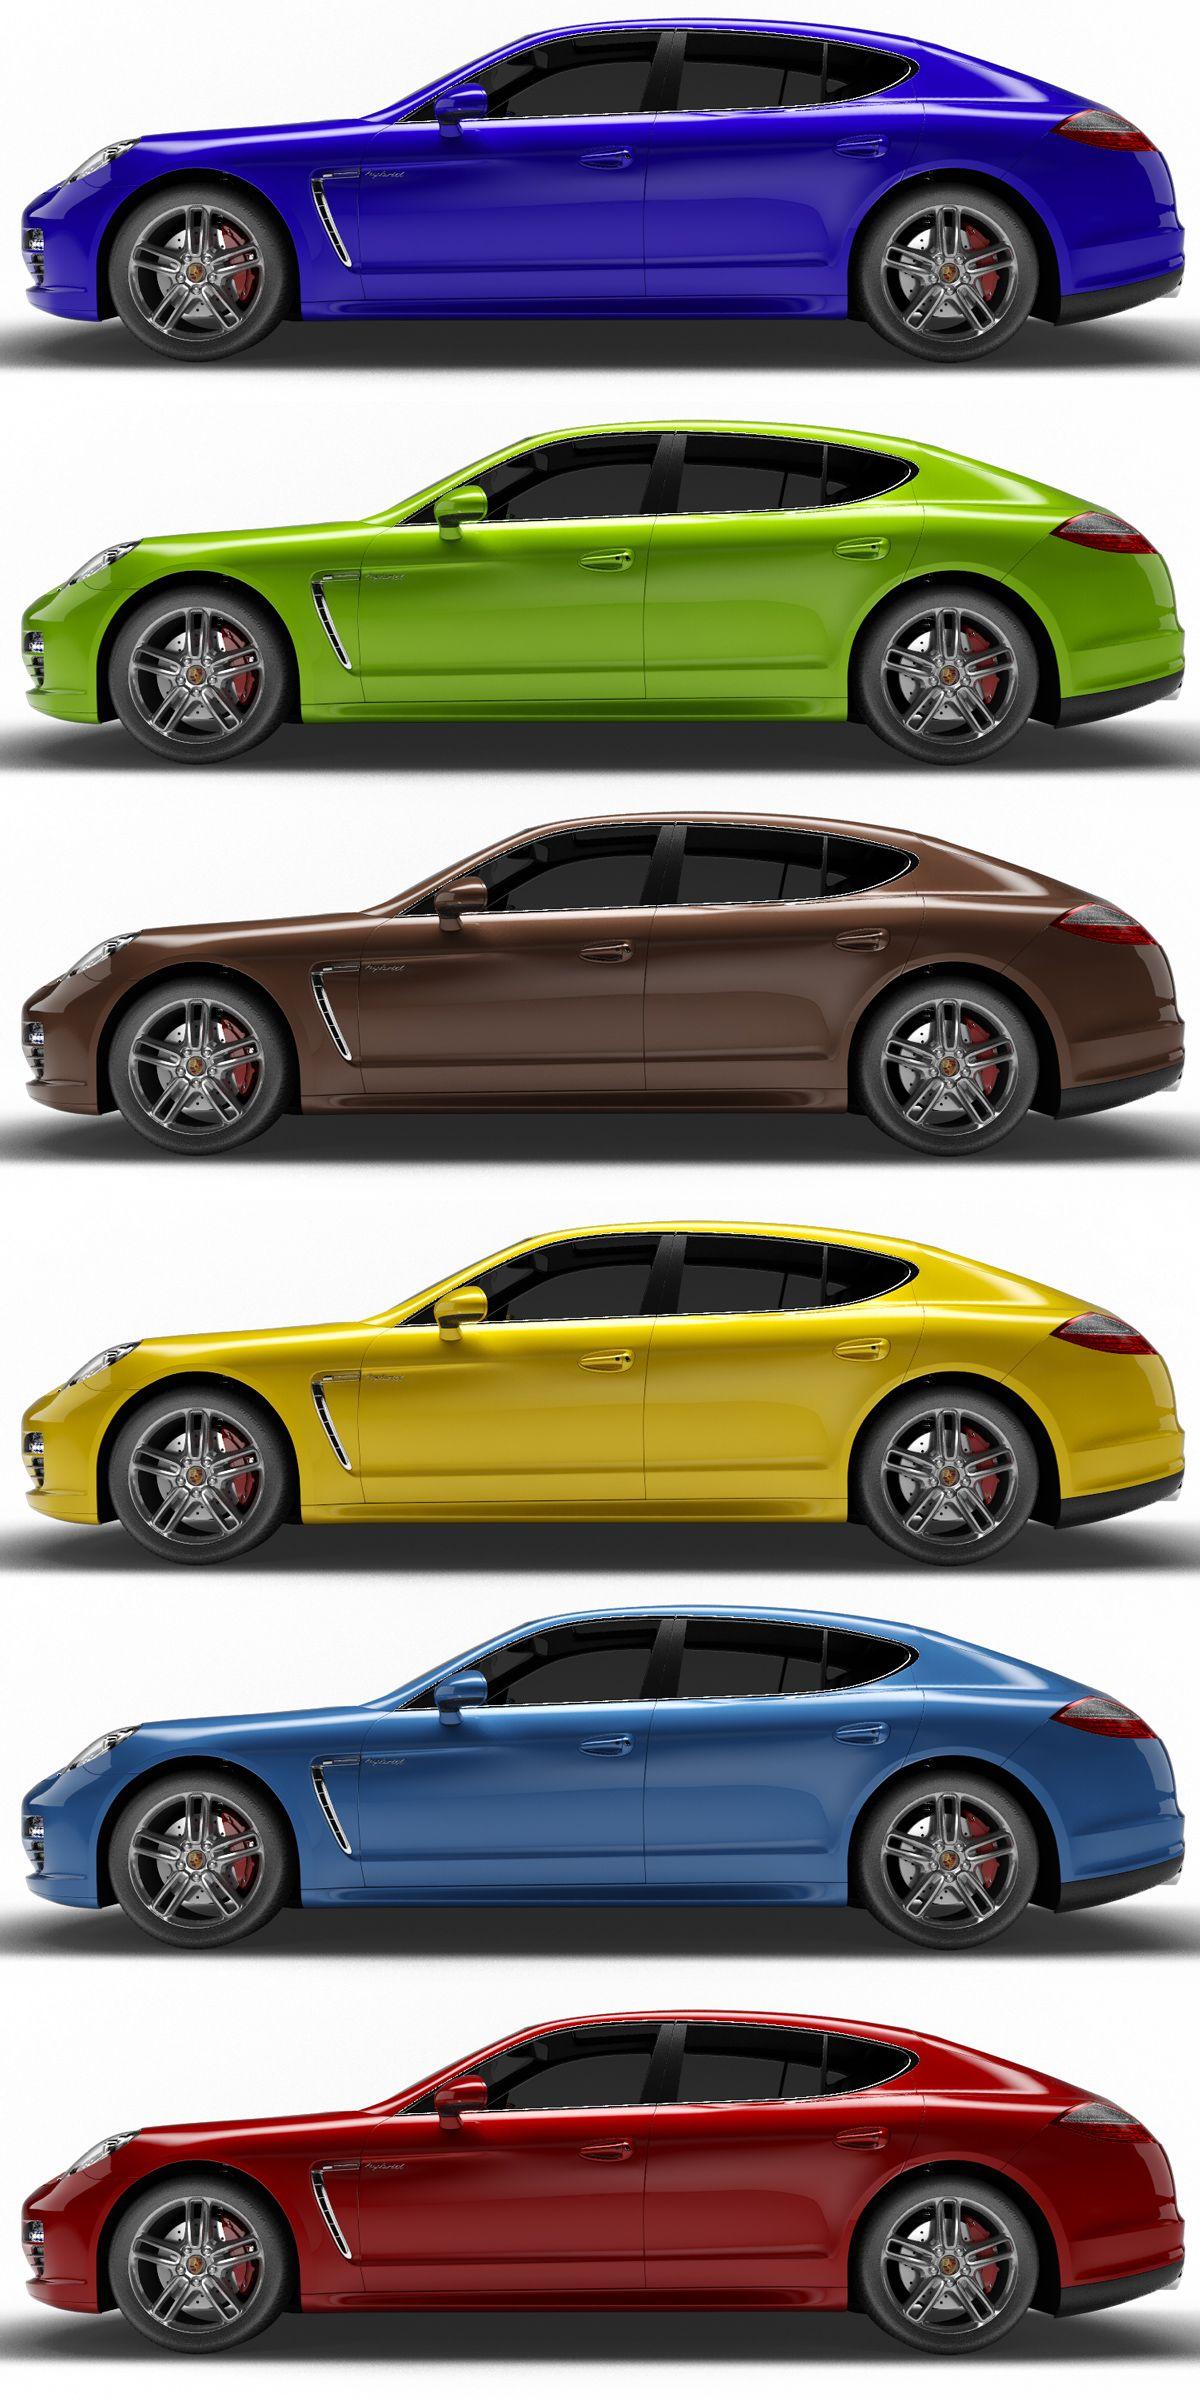 Porsche Panamera S Hybrid 6 Colors Panamera Porsche Colors Hybrid Porsche Panamera Porsche Hybrid Car